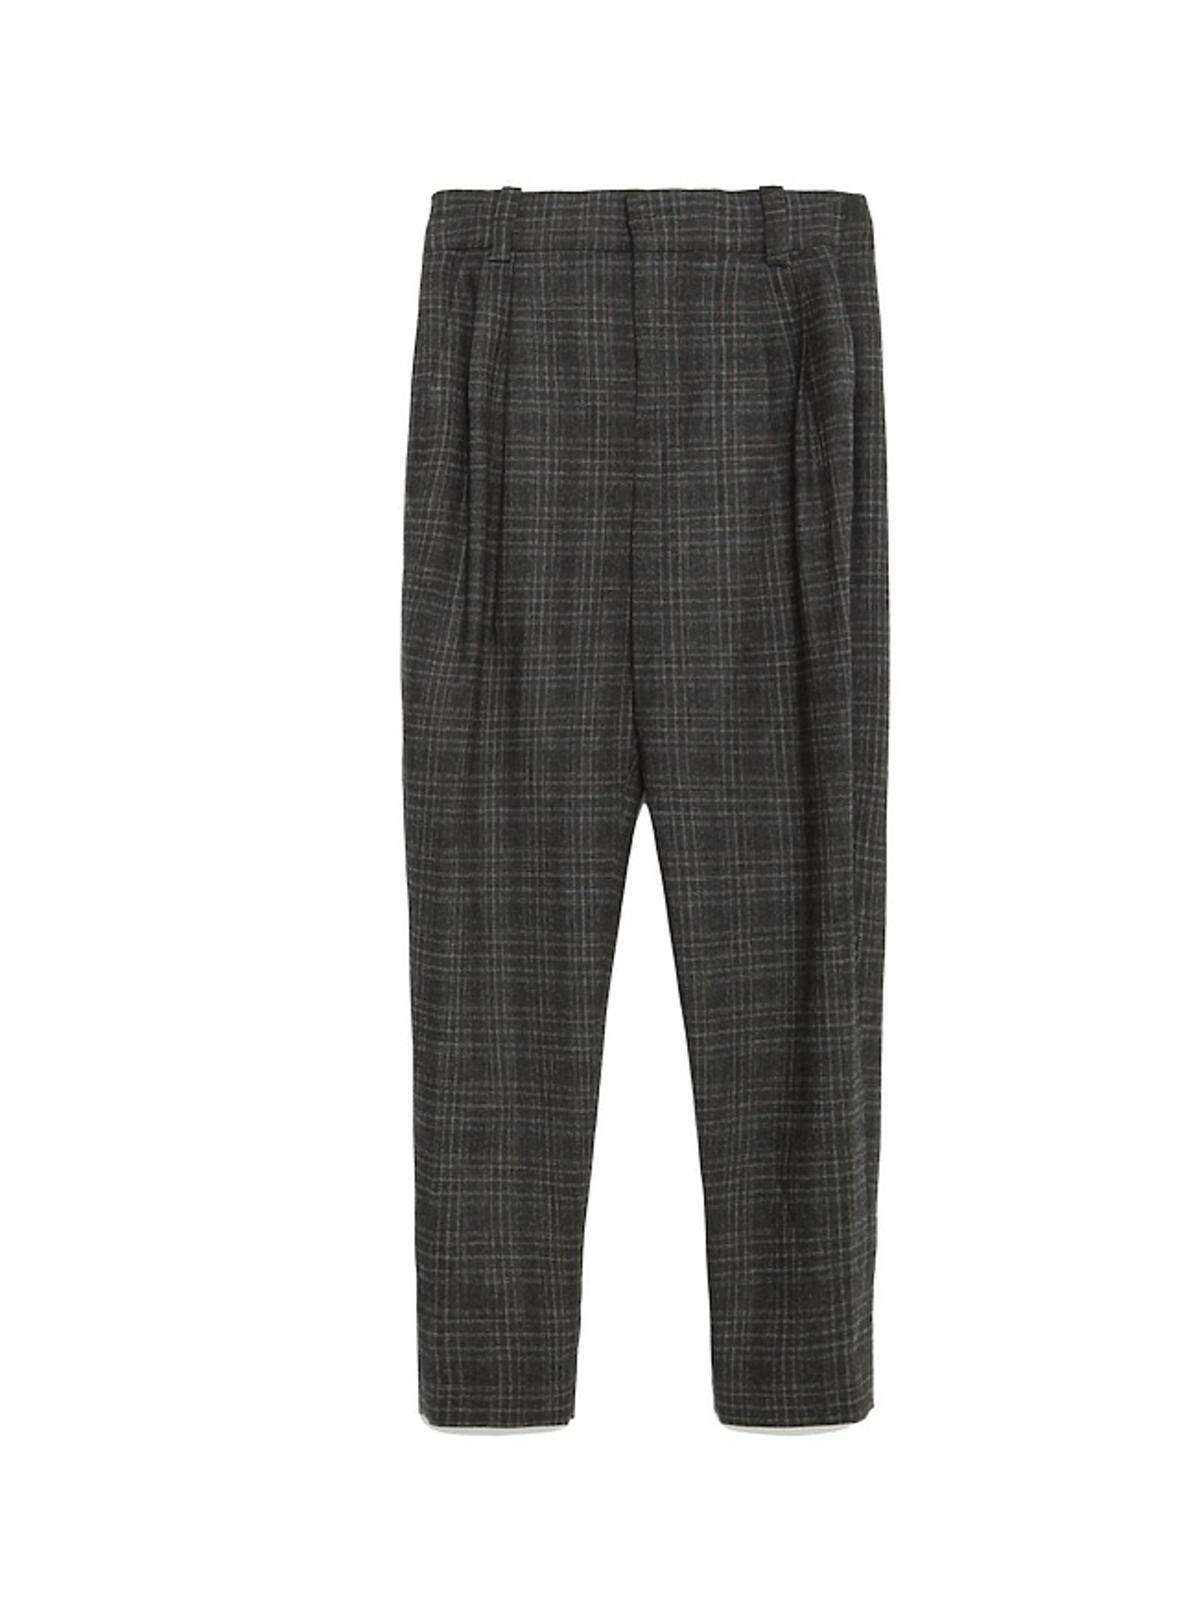 Spodnie Zara, 199 zł